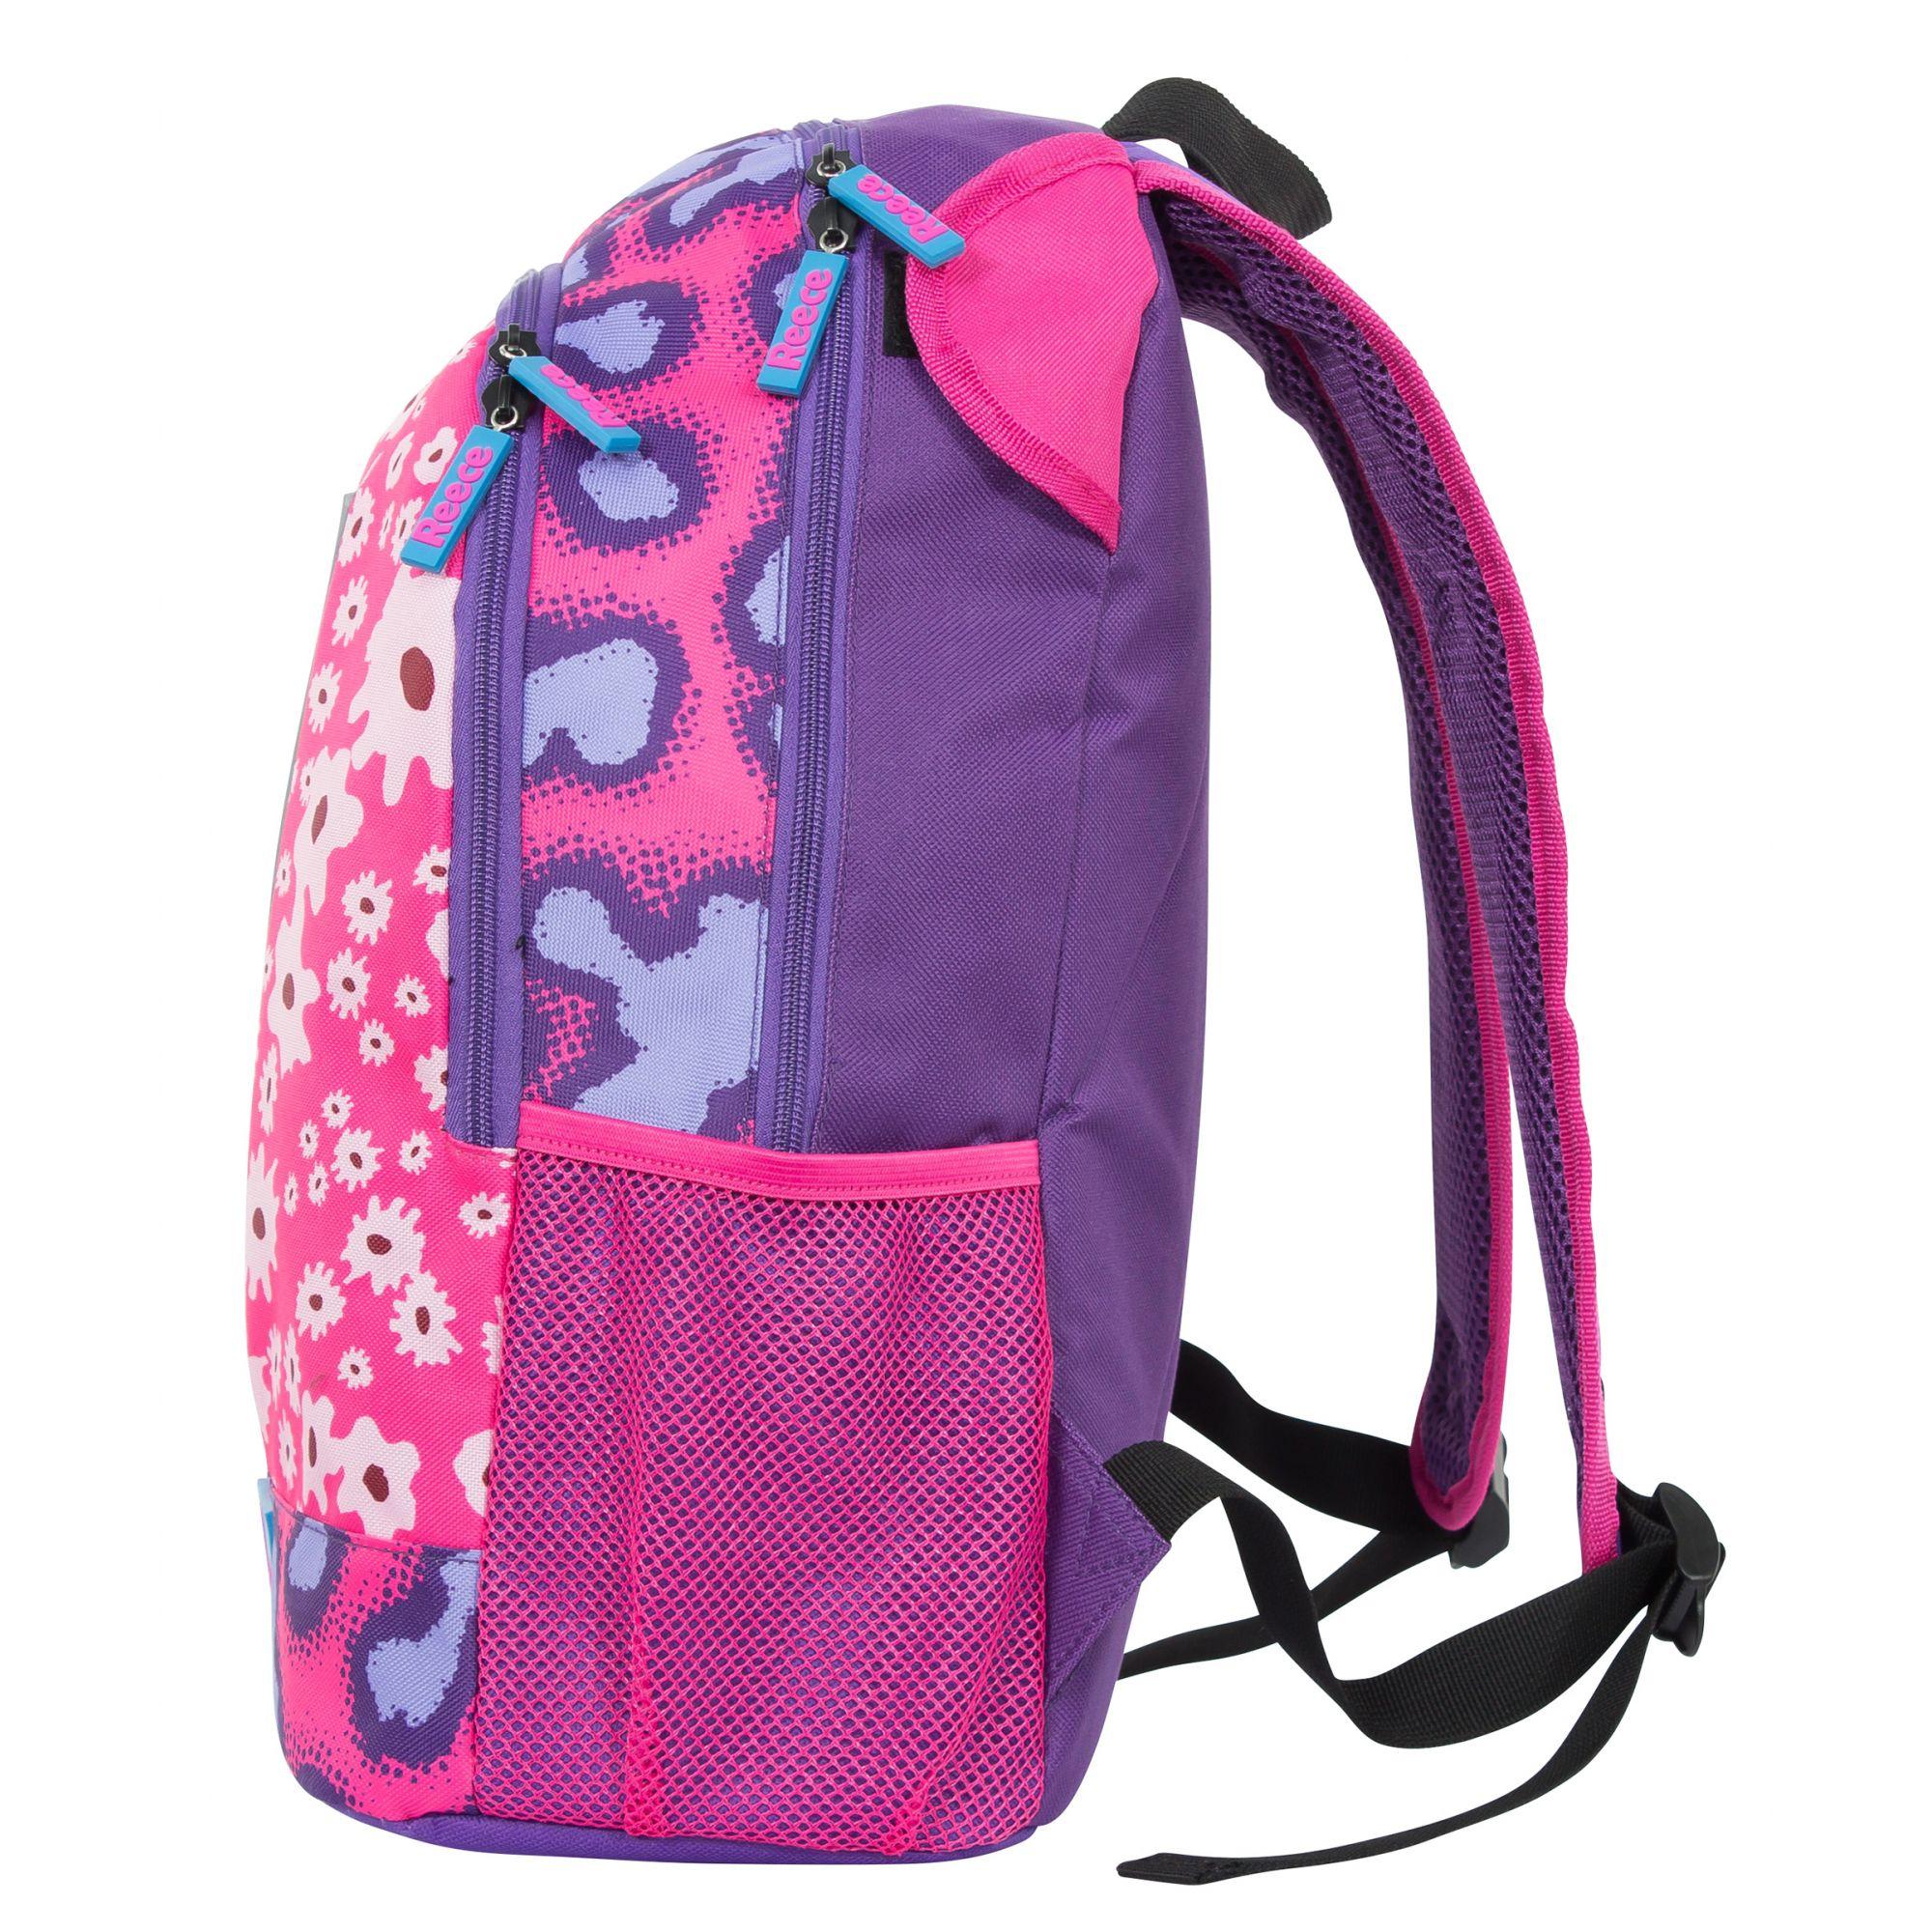 bedb22161f1 Reece Australia-Evans Hockey Backpack-885803-0670-NO SZ-roze ...